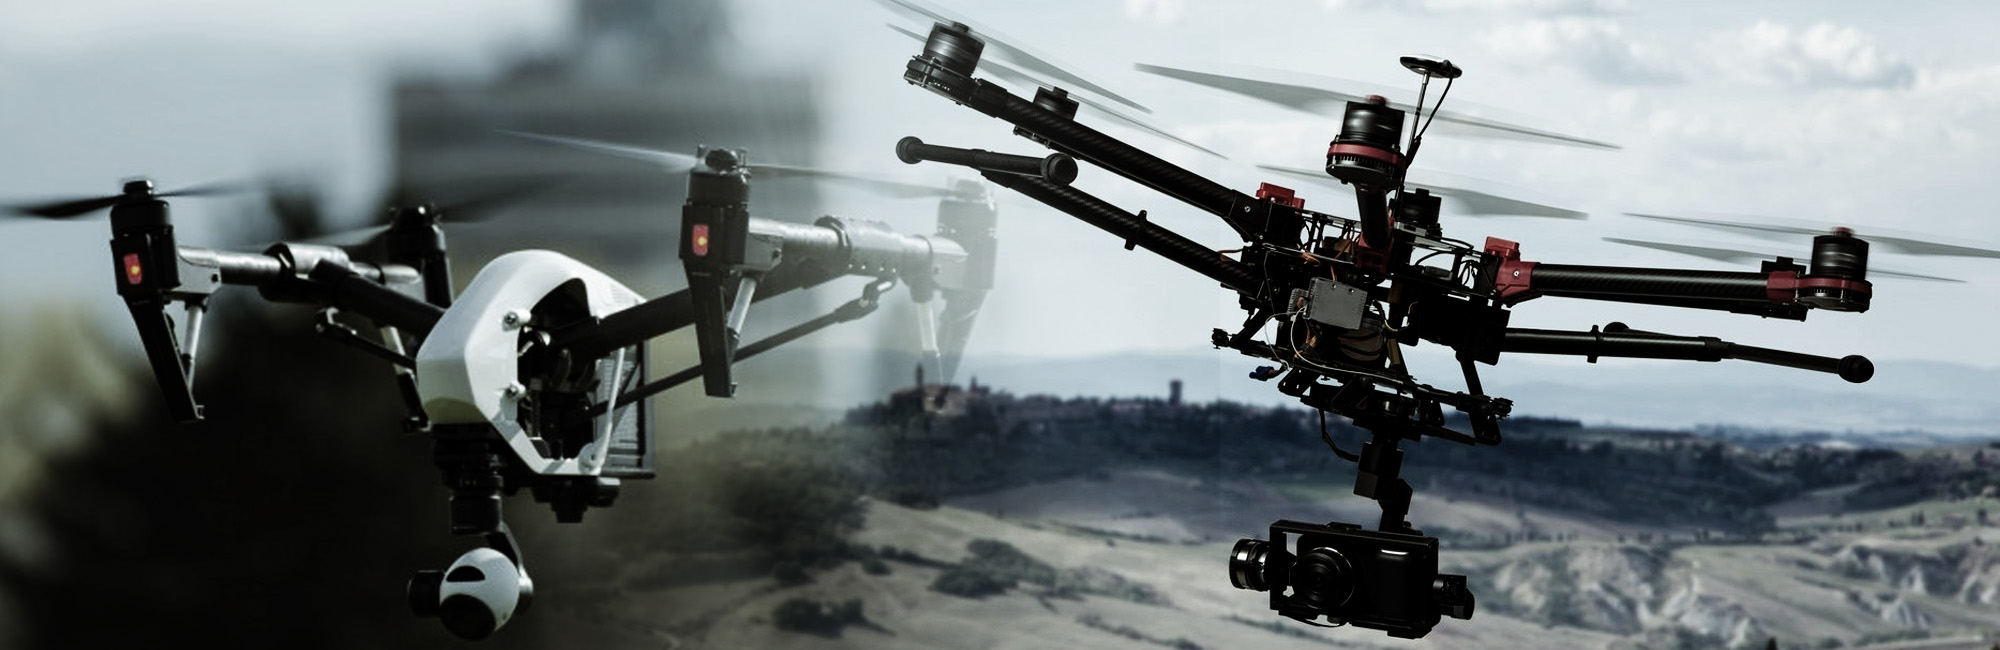 topografia fotogrammetria-drone-rilievi-fotogrammetrici-aerofotogrammetria